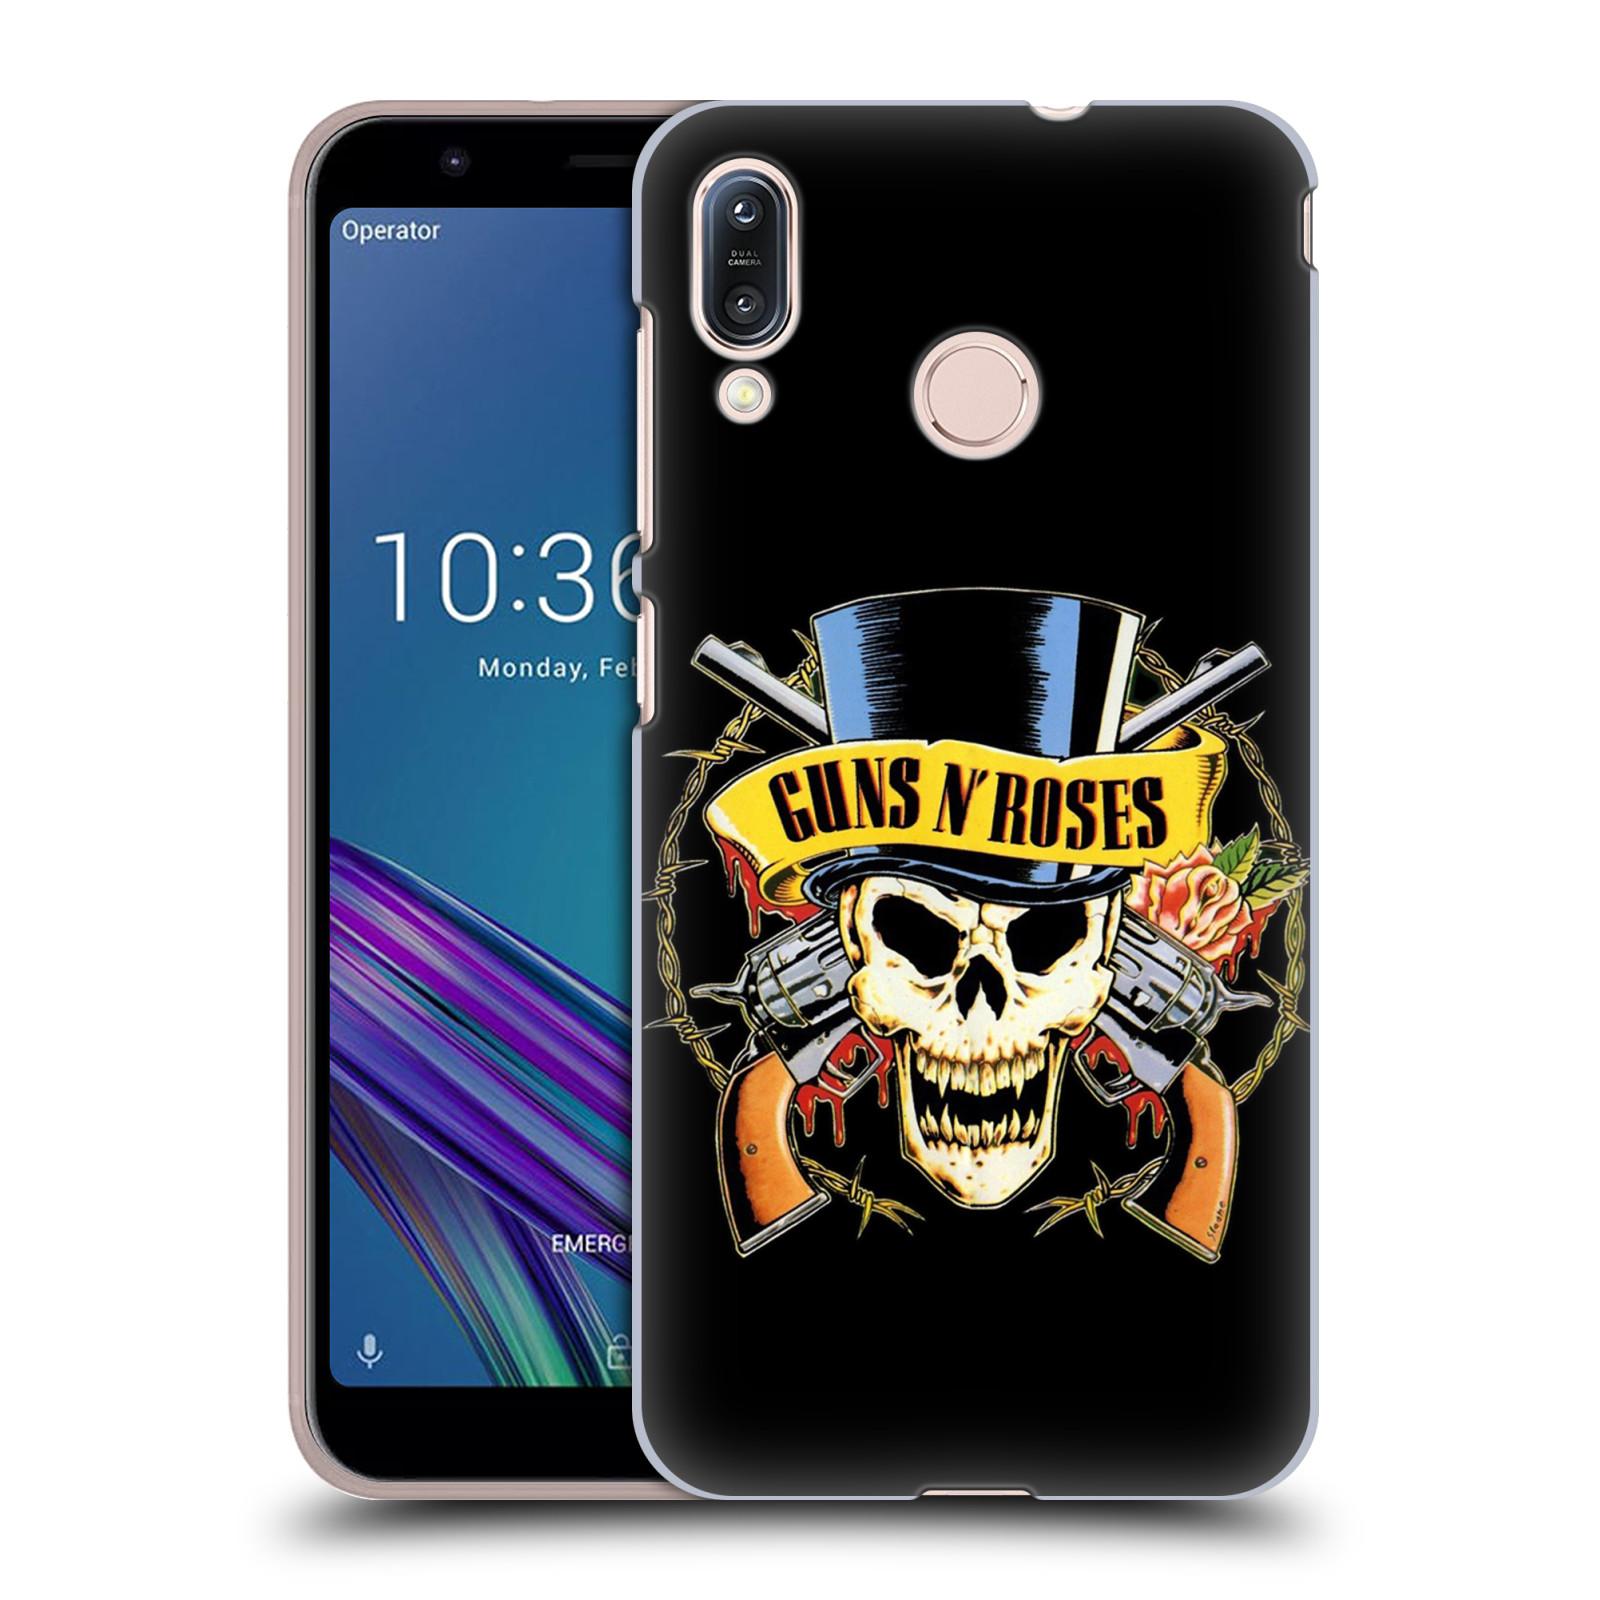 Plastové pouzdro na mobil Asus Zenfone Max M1 ZB555KL - Head Case - Guns N' Roses - Lebka